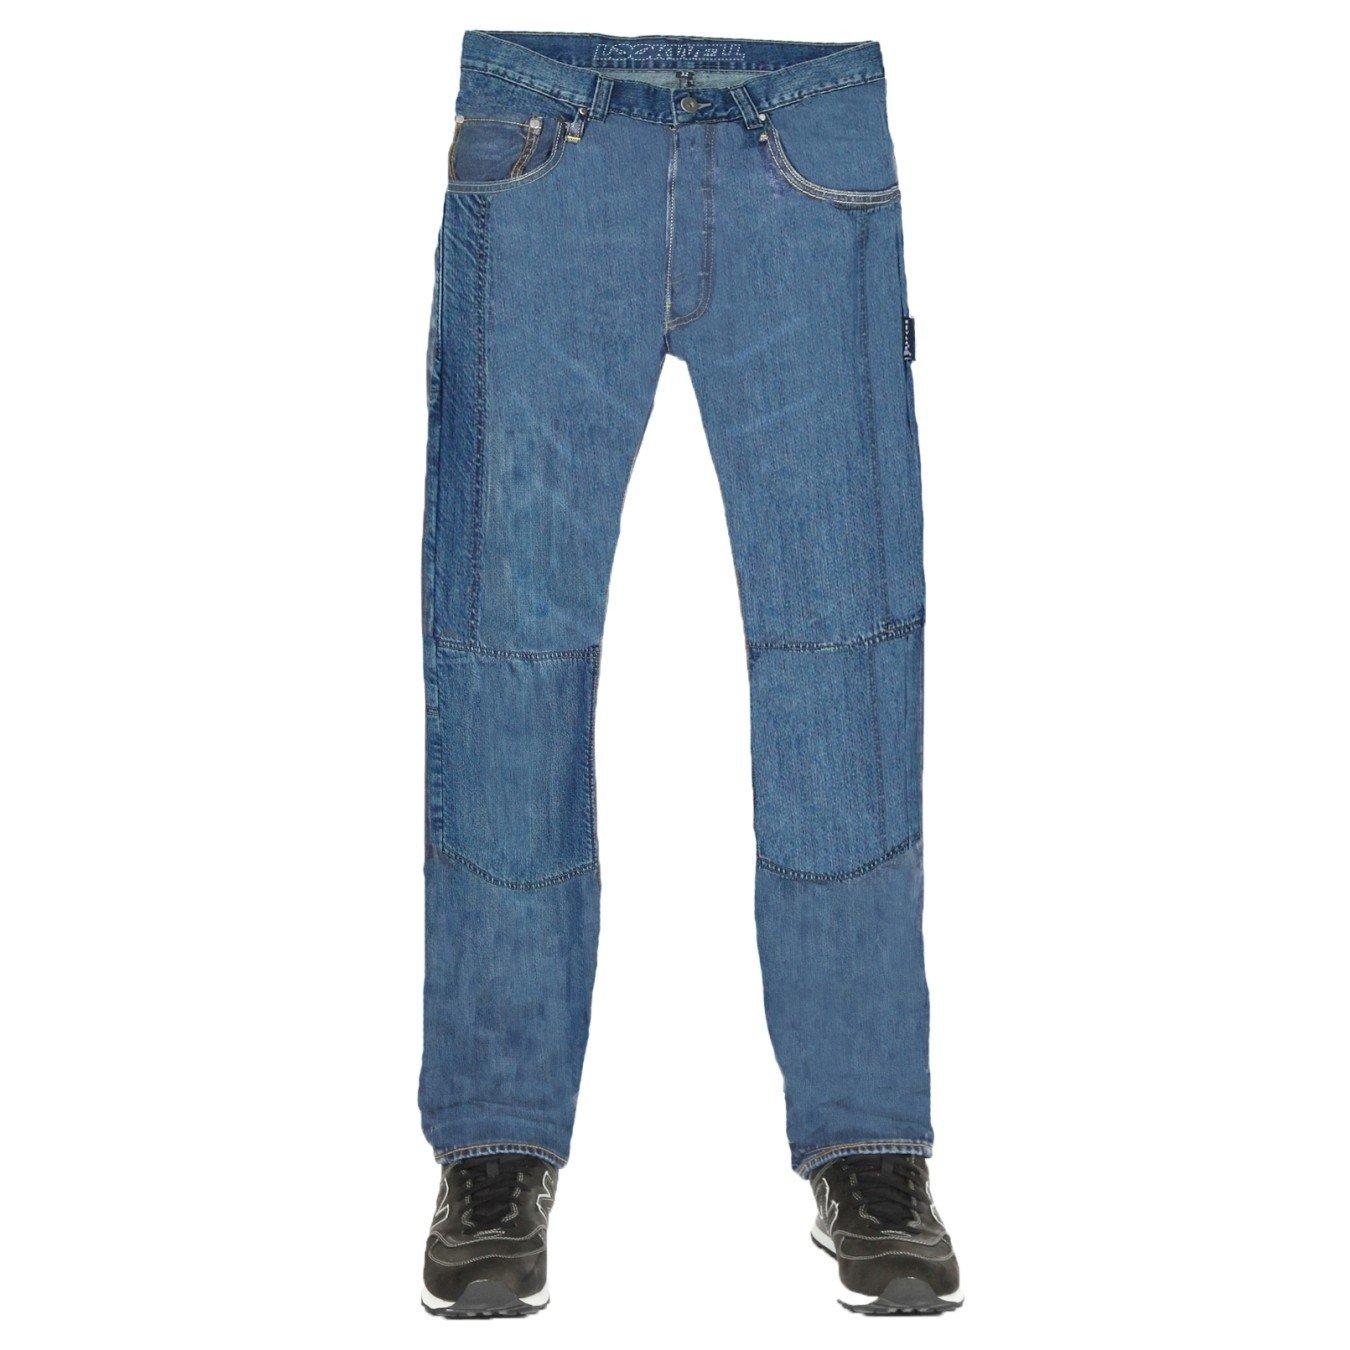 Lookwell Denim-Aramid 501 modré Jeans Blue 48/S (28)